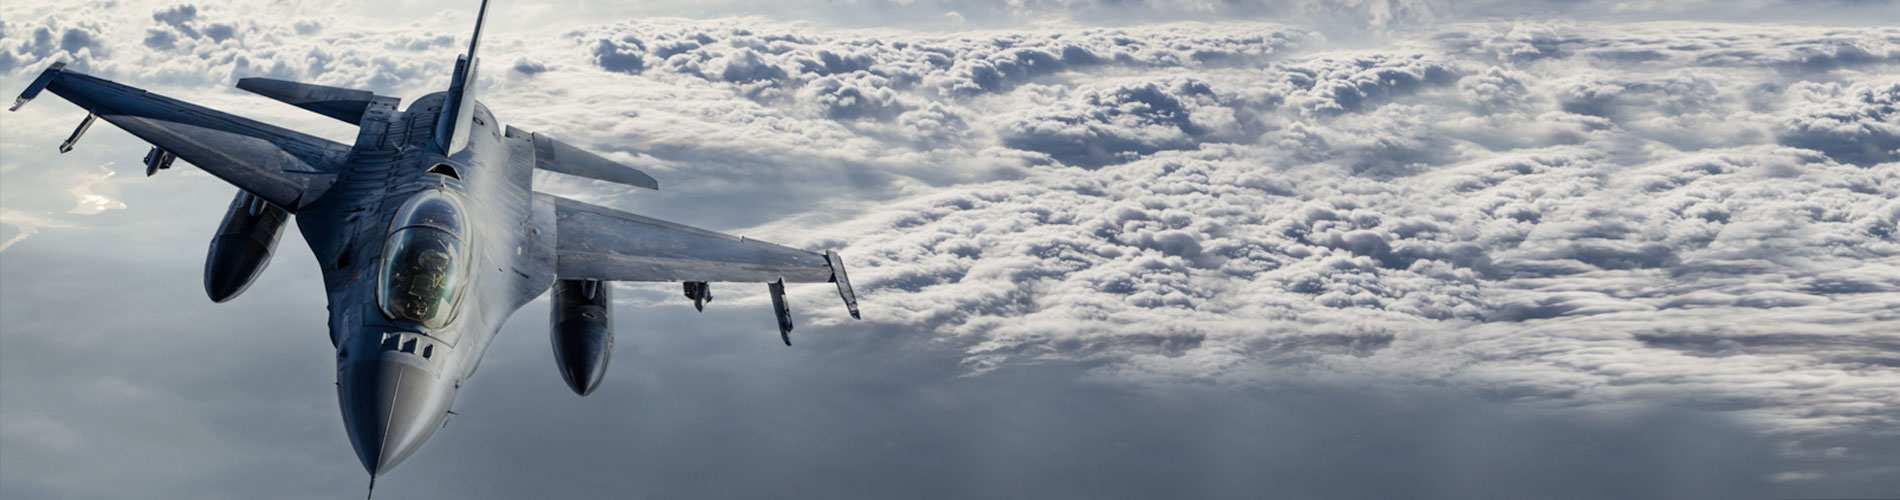 AeroscpaceSystems_Market_Header